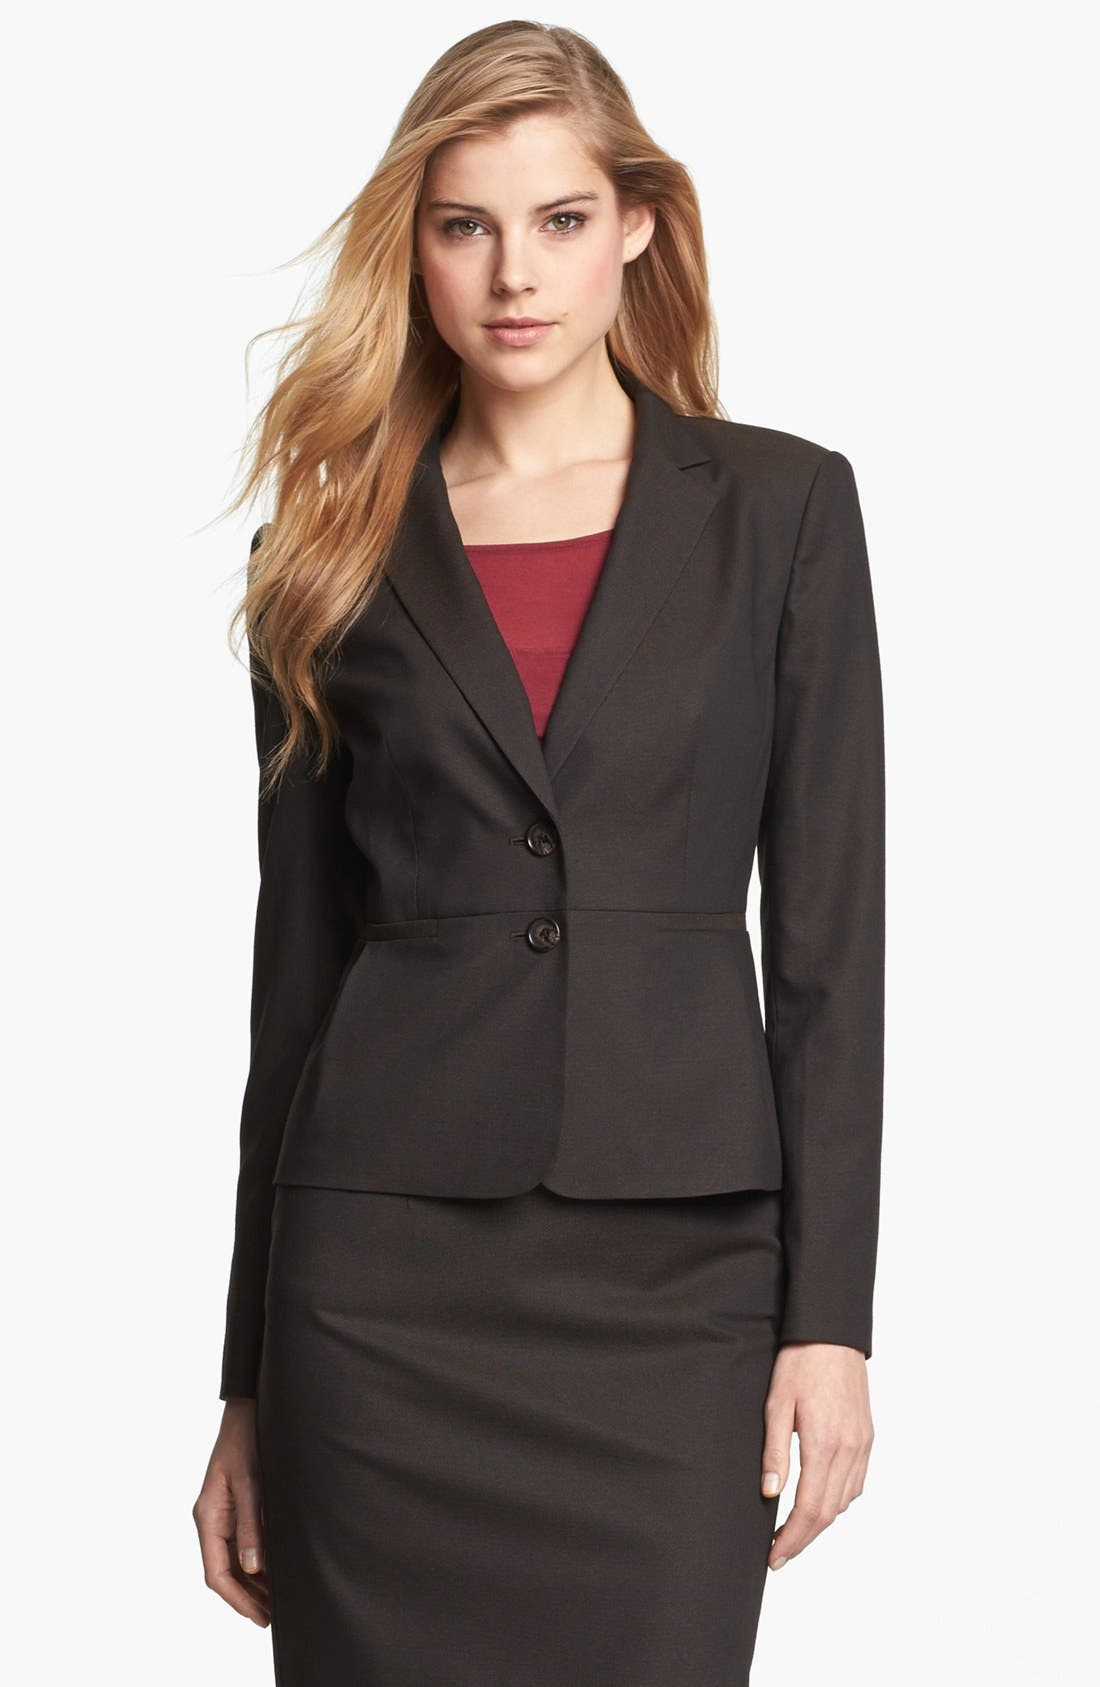 Alternate Image 1 Selected - Halogen® Suit Jacket (Petite)